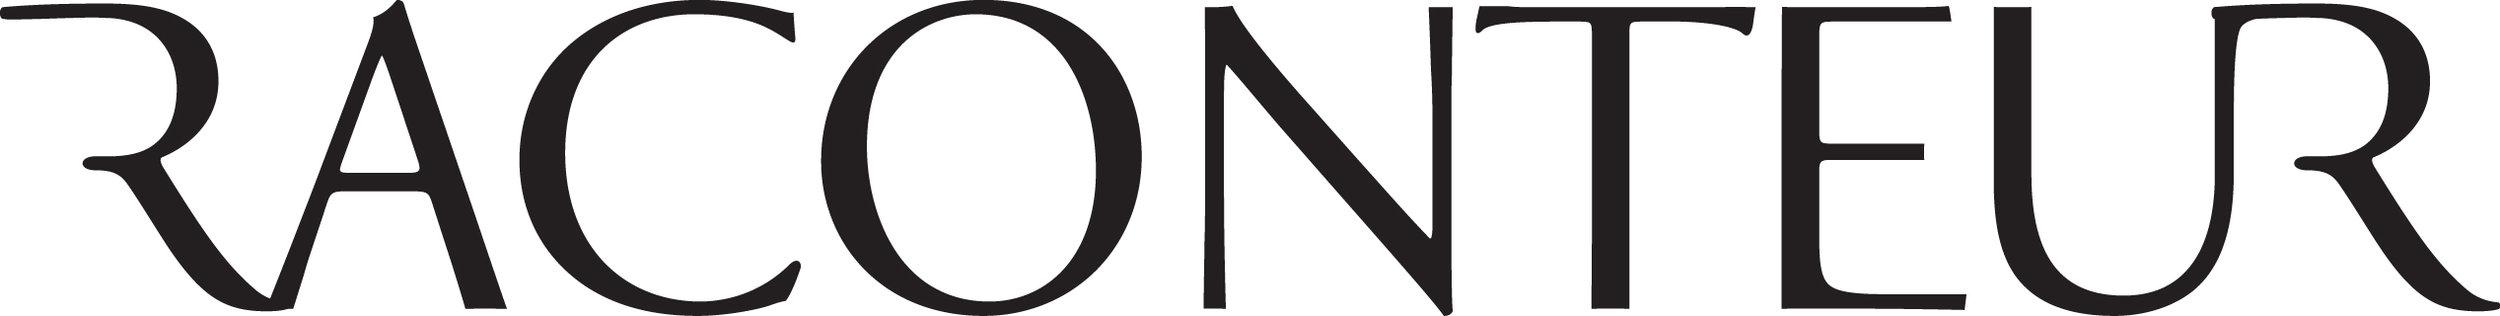 Raconteur-Logo.jpg